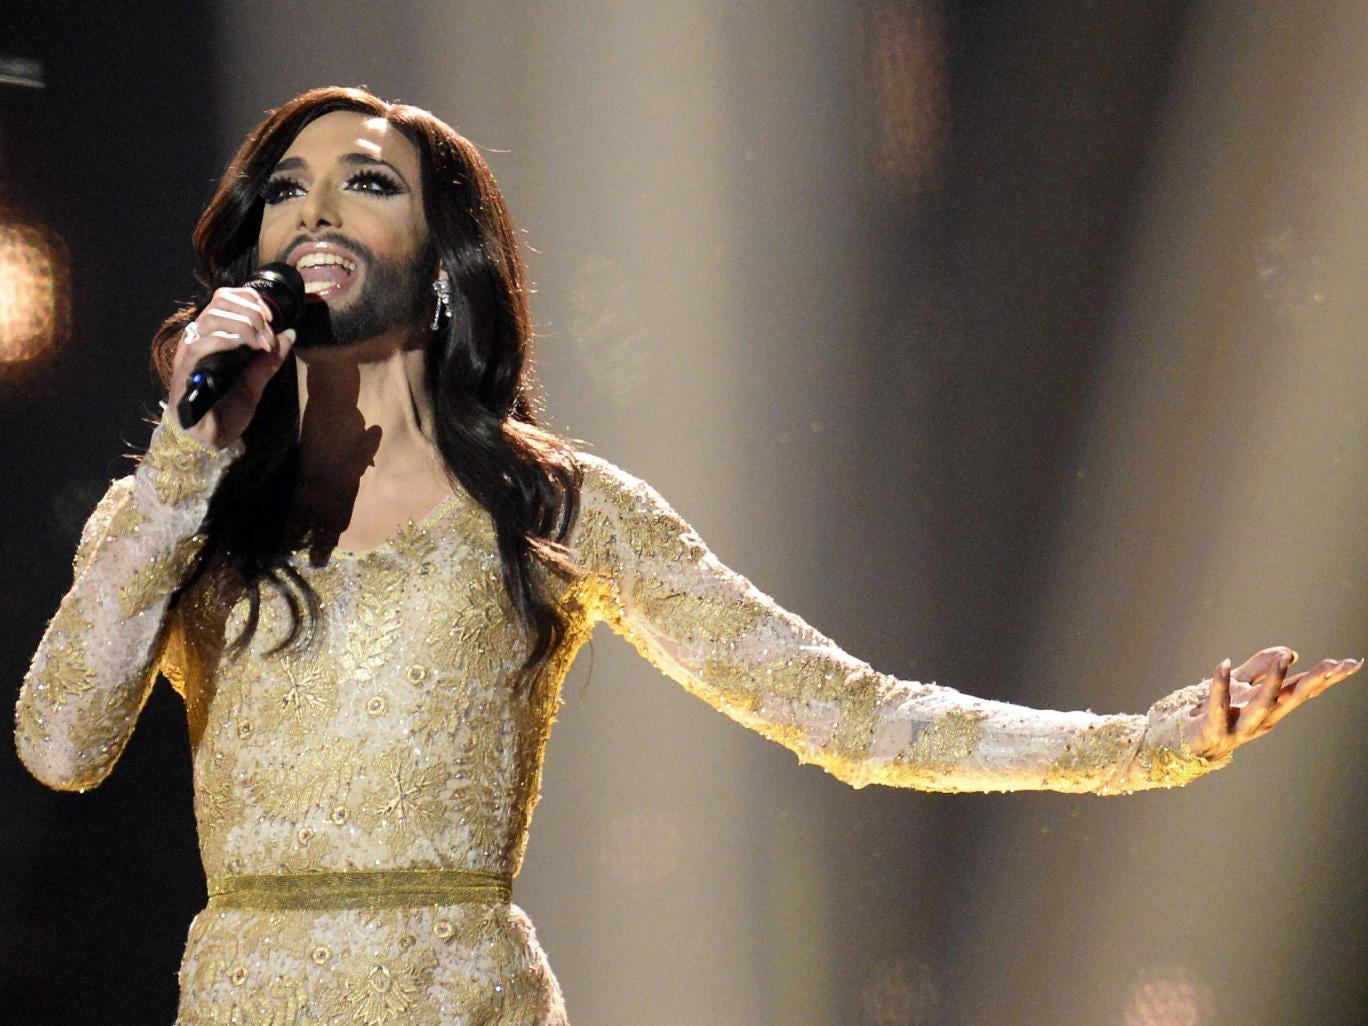 Conchita Wurst representing Austria performs during the Eurovision Song Contest 2014 Grand Final in Copenhagen, Denmark